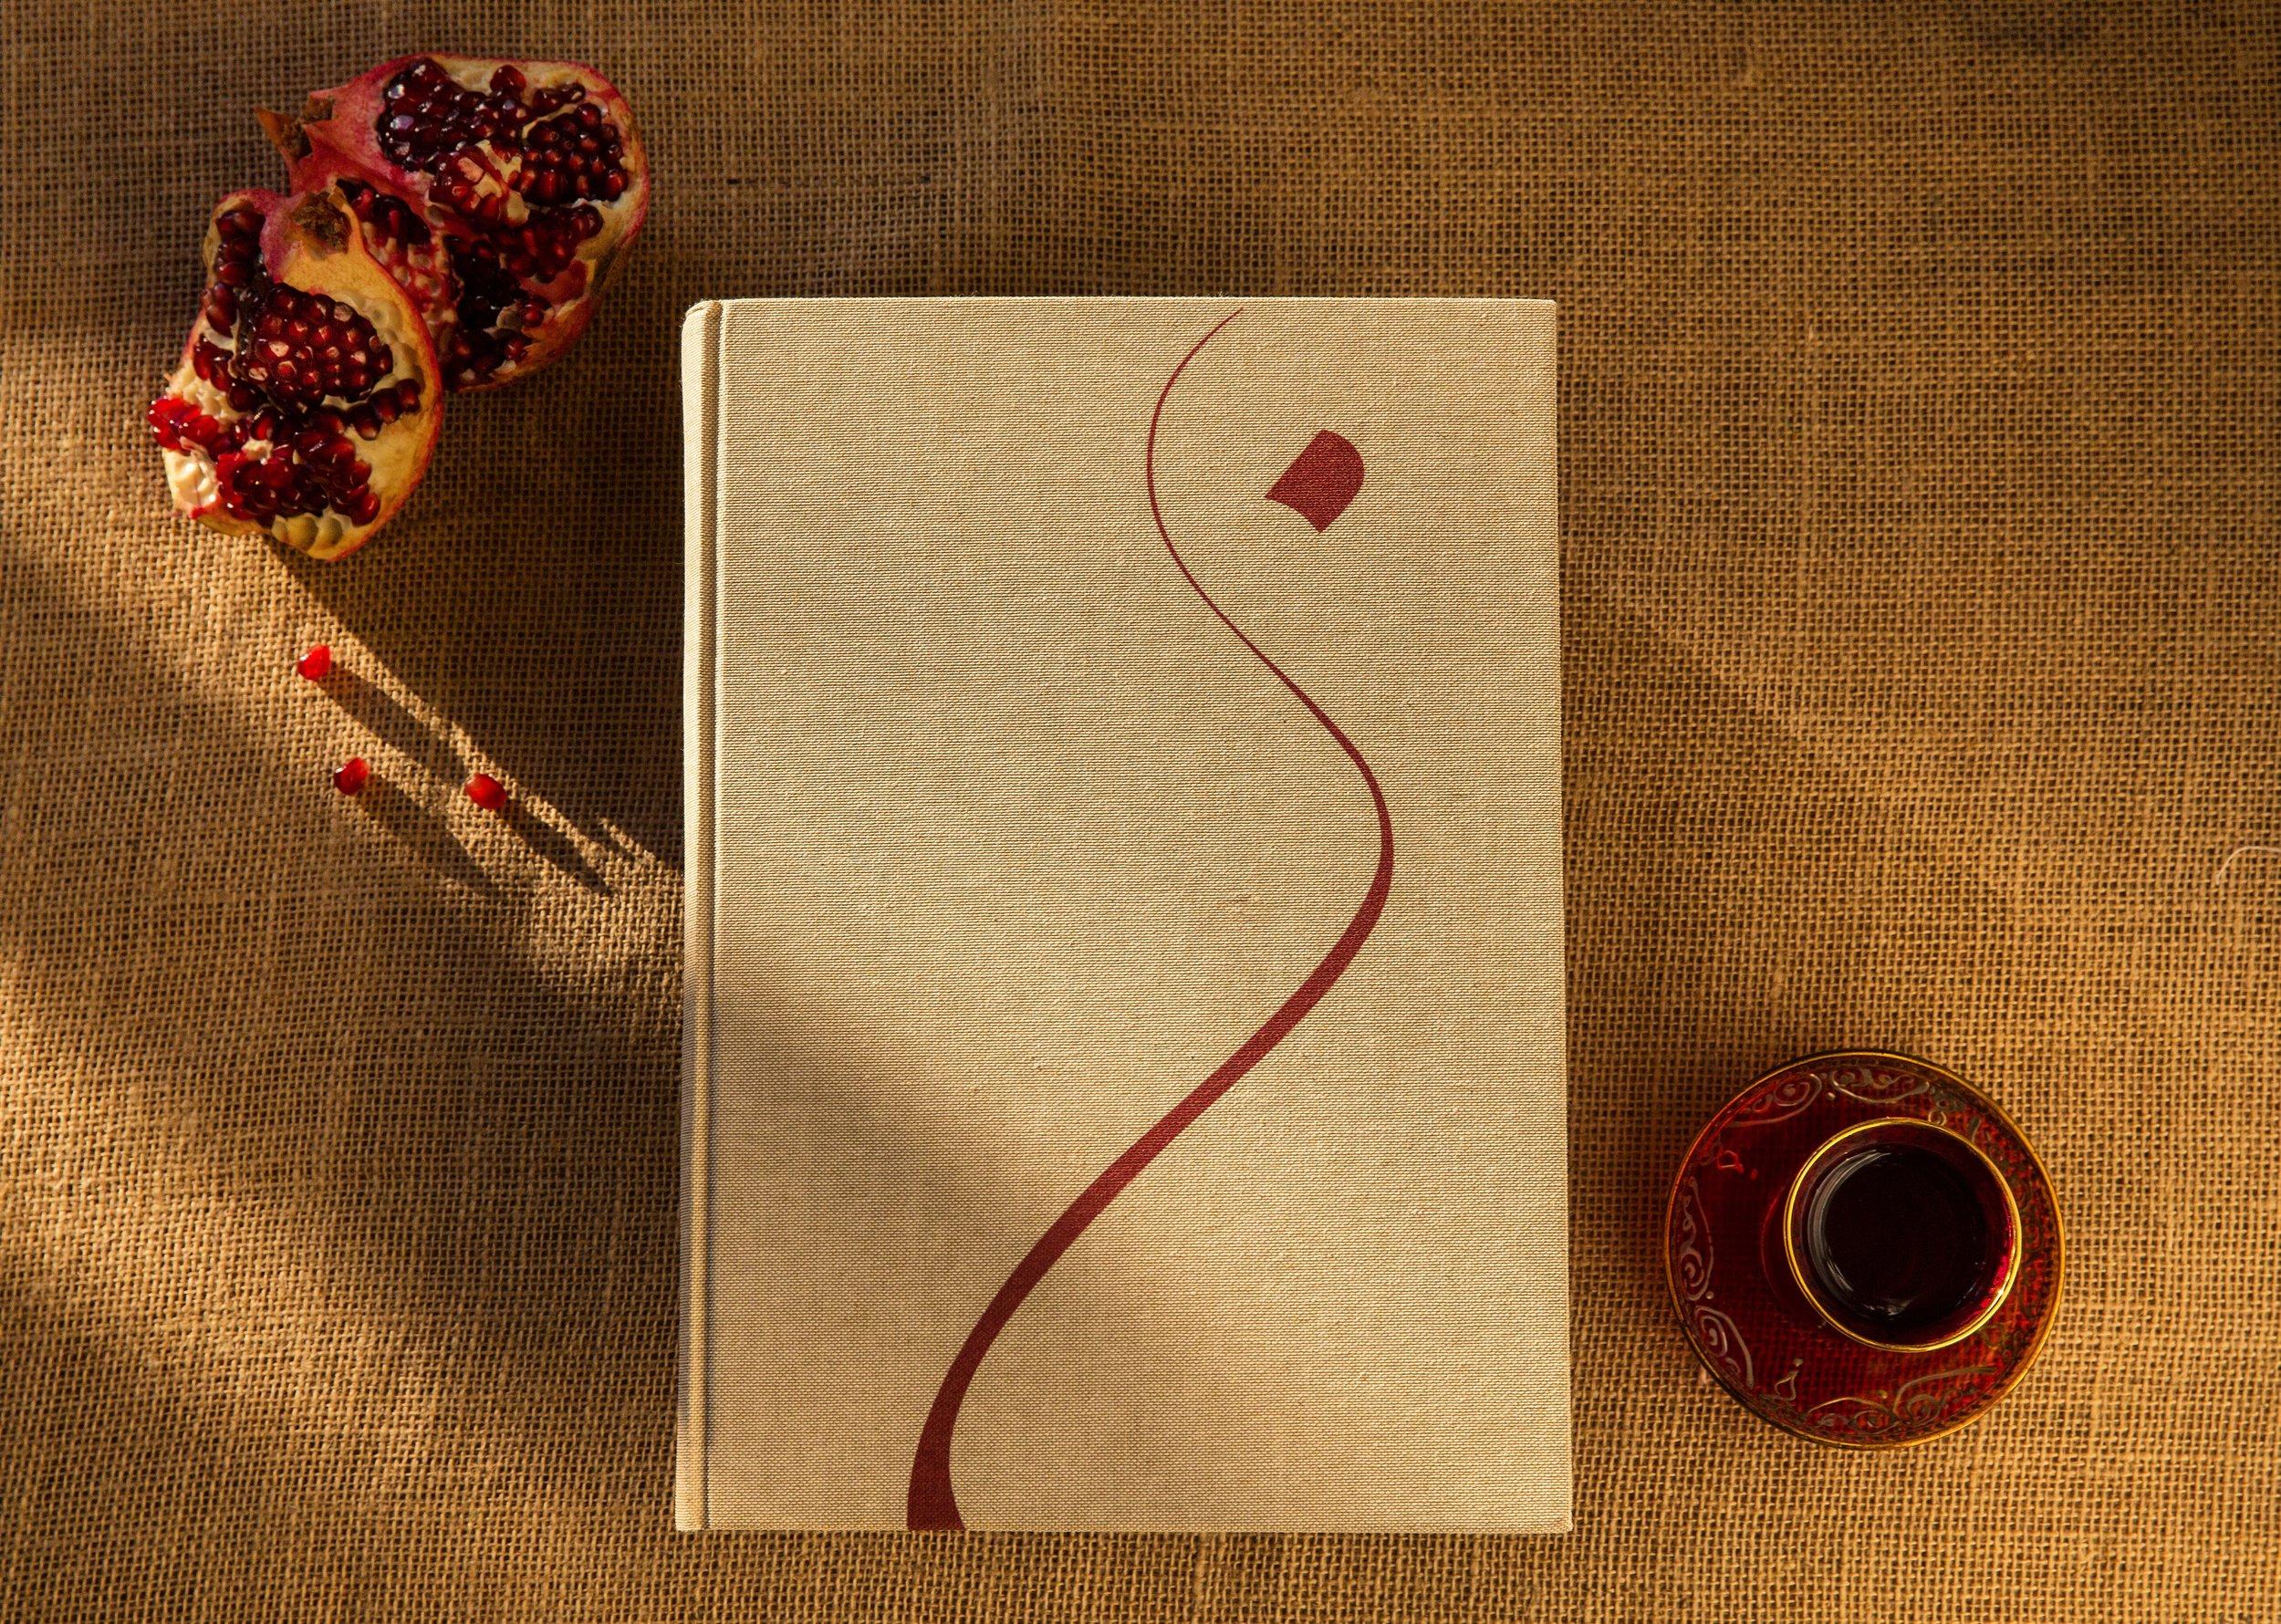 Private Collection, a coffee table book by Neave Bozorgi